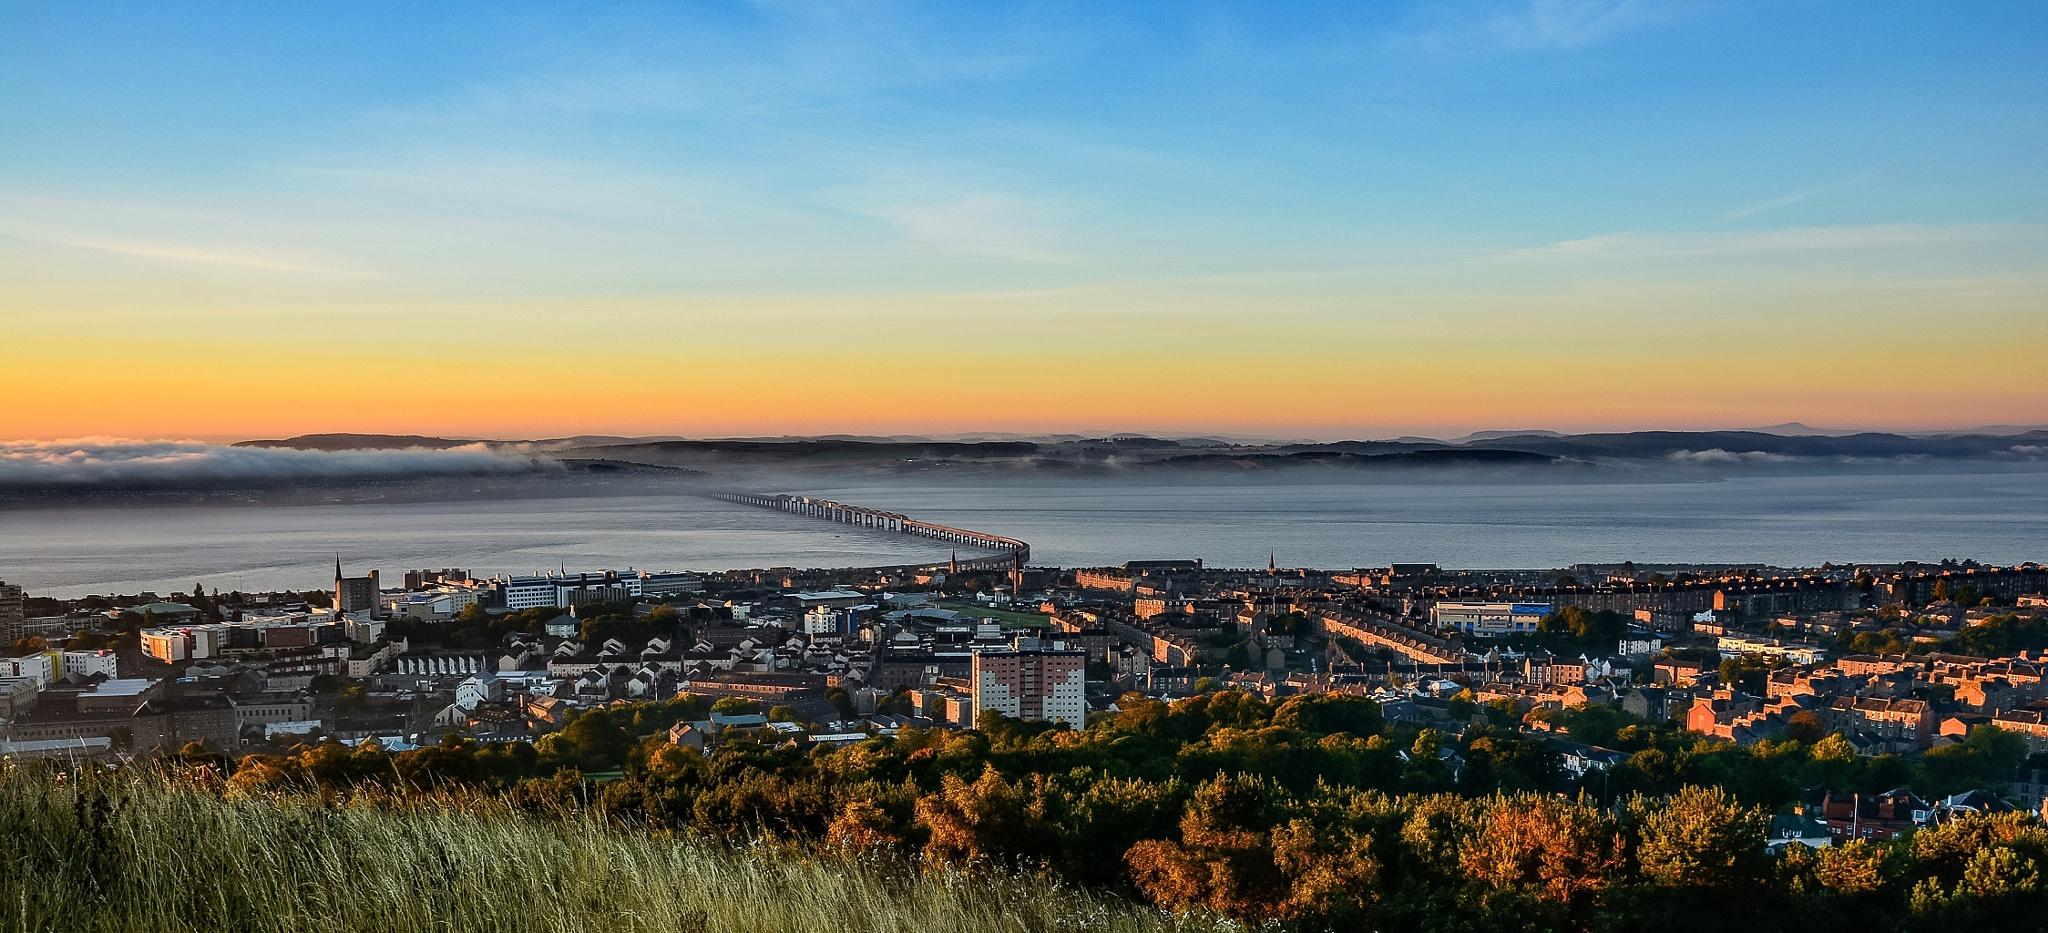 Tay Rail Bridge Dundee Scotland by Jock Elliott